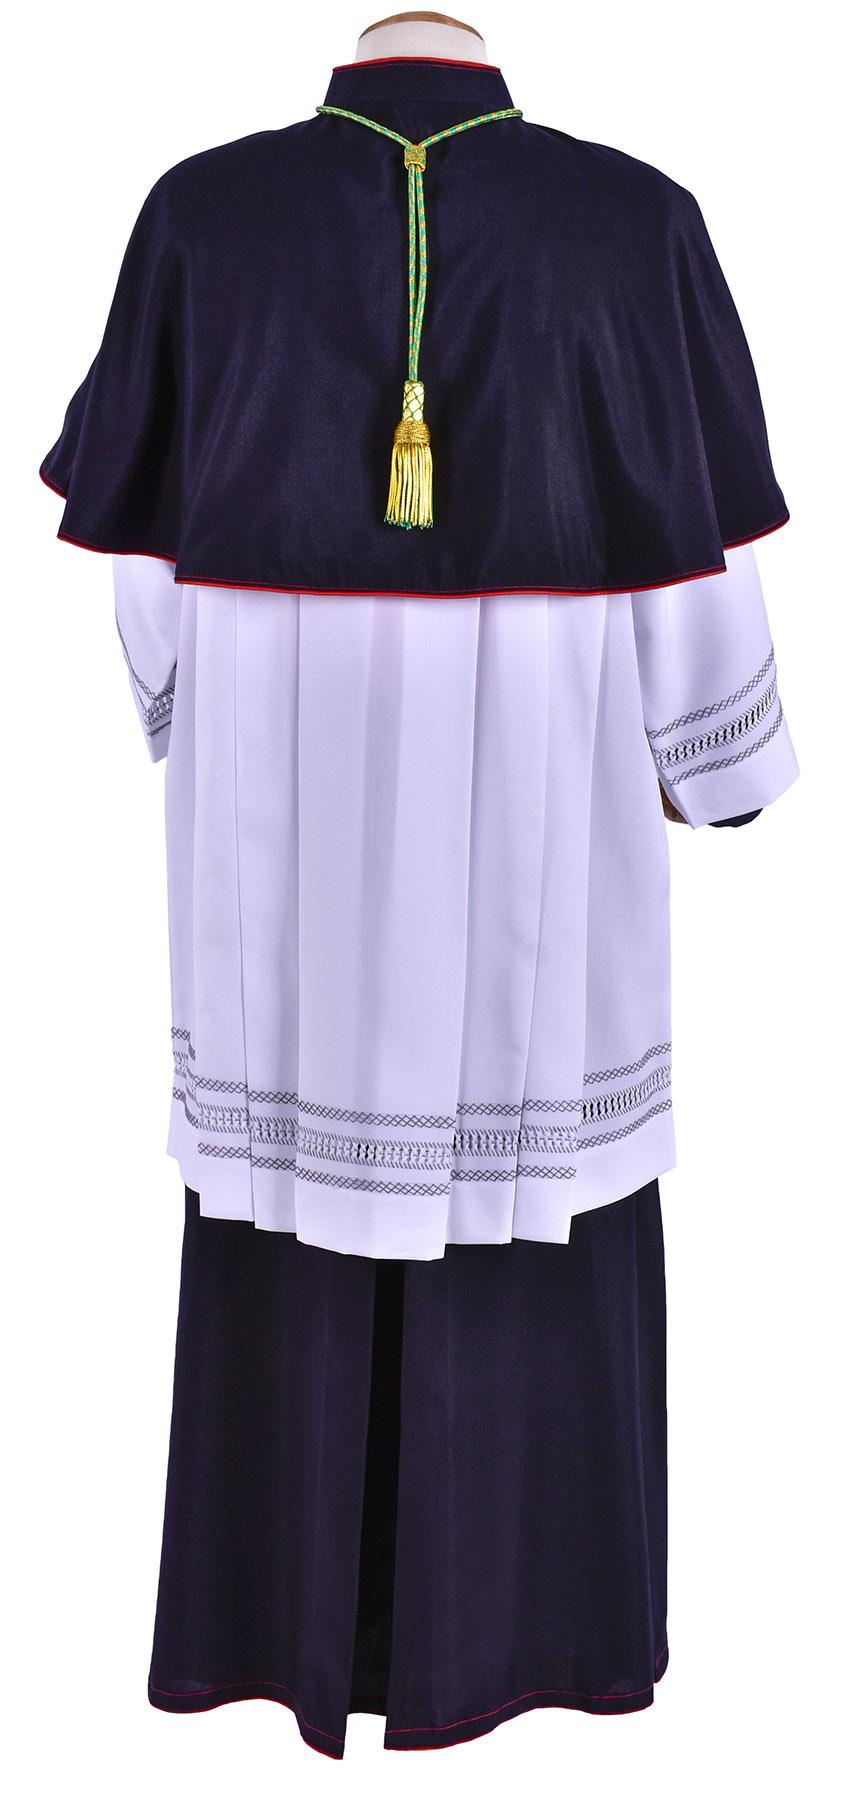 Mozeta Episcopal Italian Cold Wool MZ602